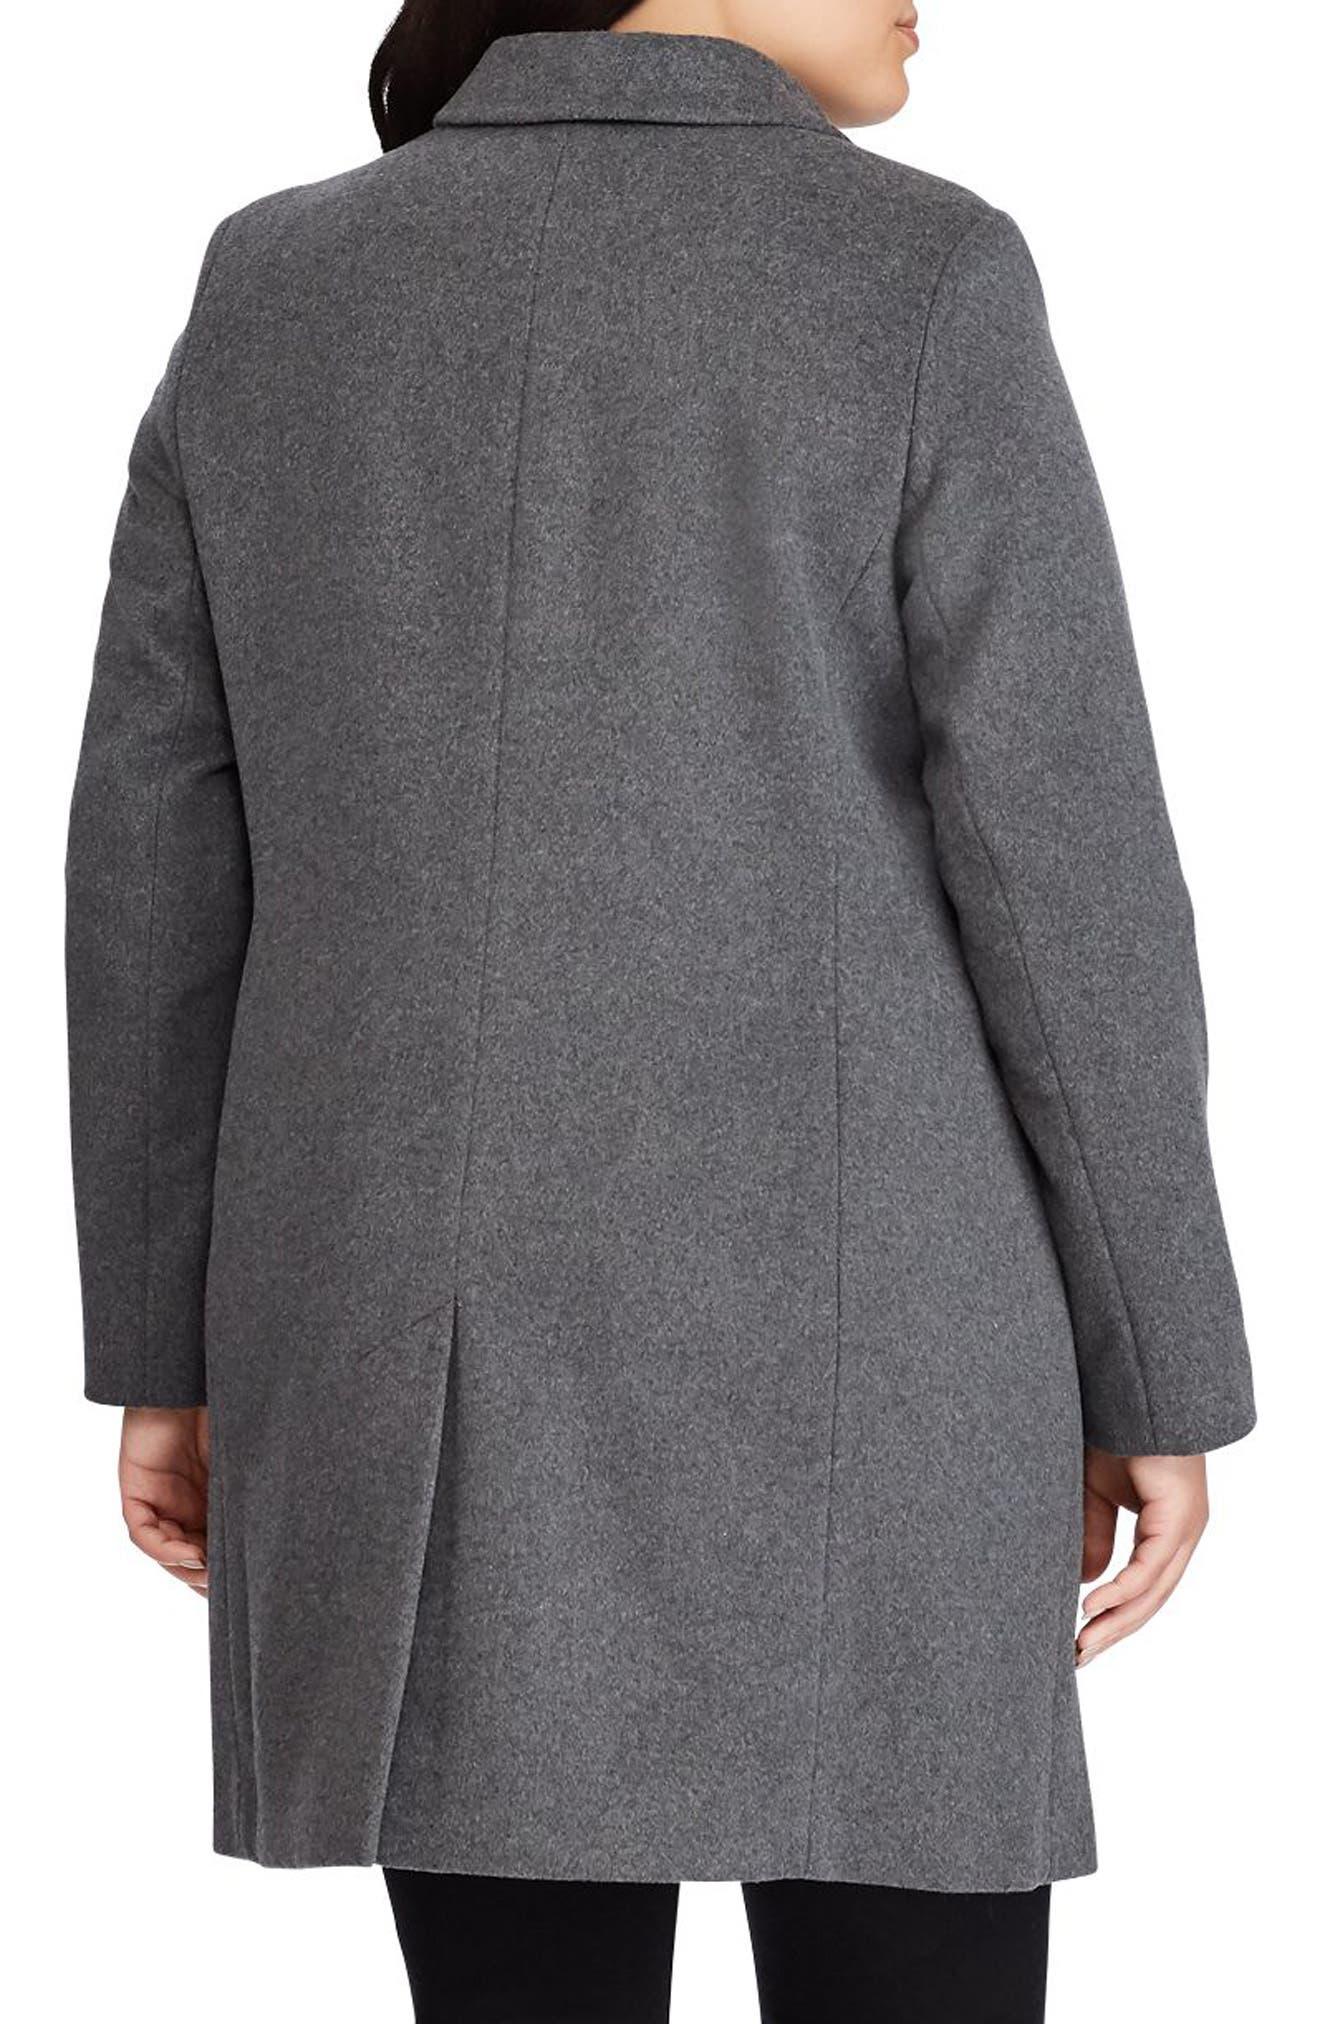 LAUREN RALPH LAUREN, Wool Blend Reefer Coat, Alternate thumbnail 2, color, 026